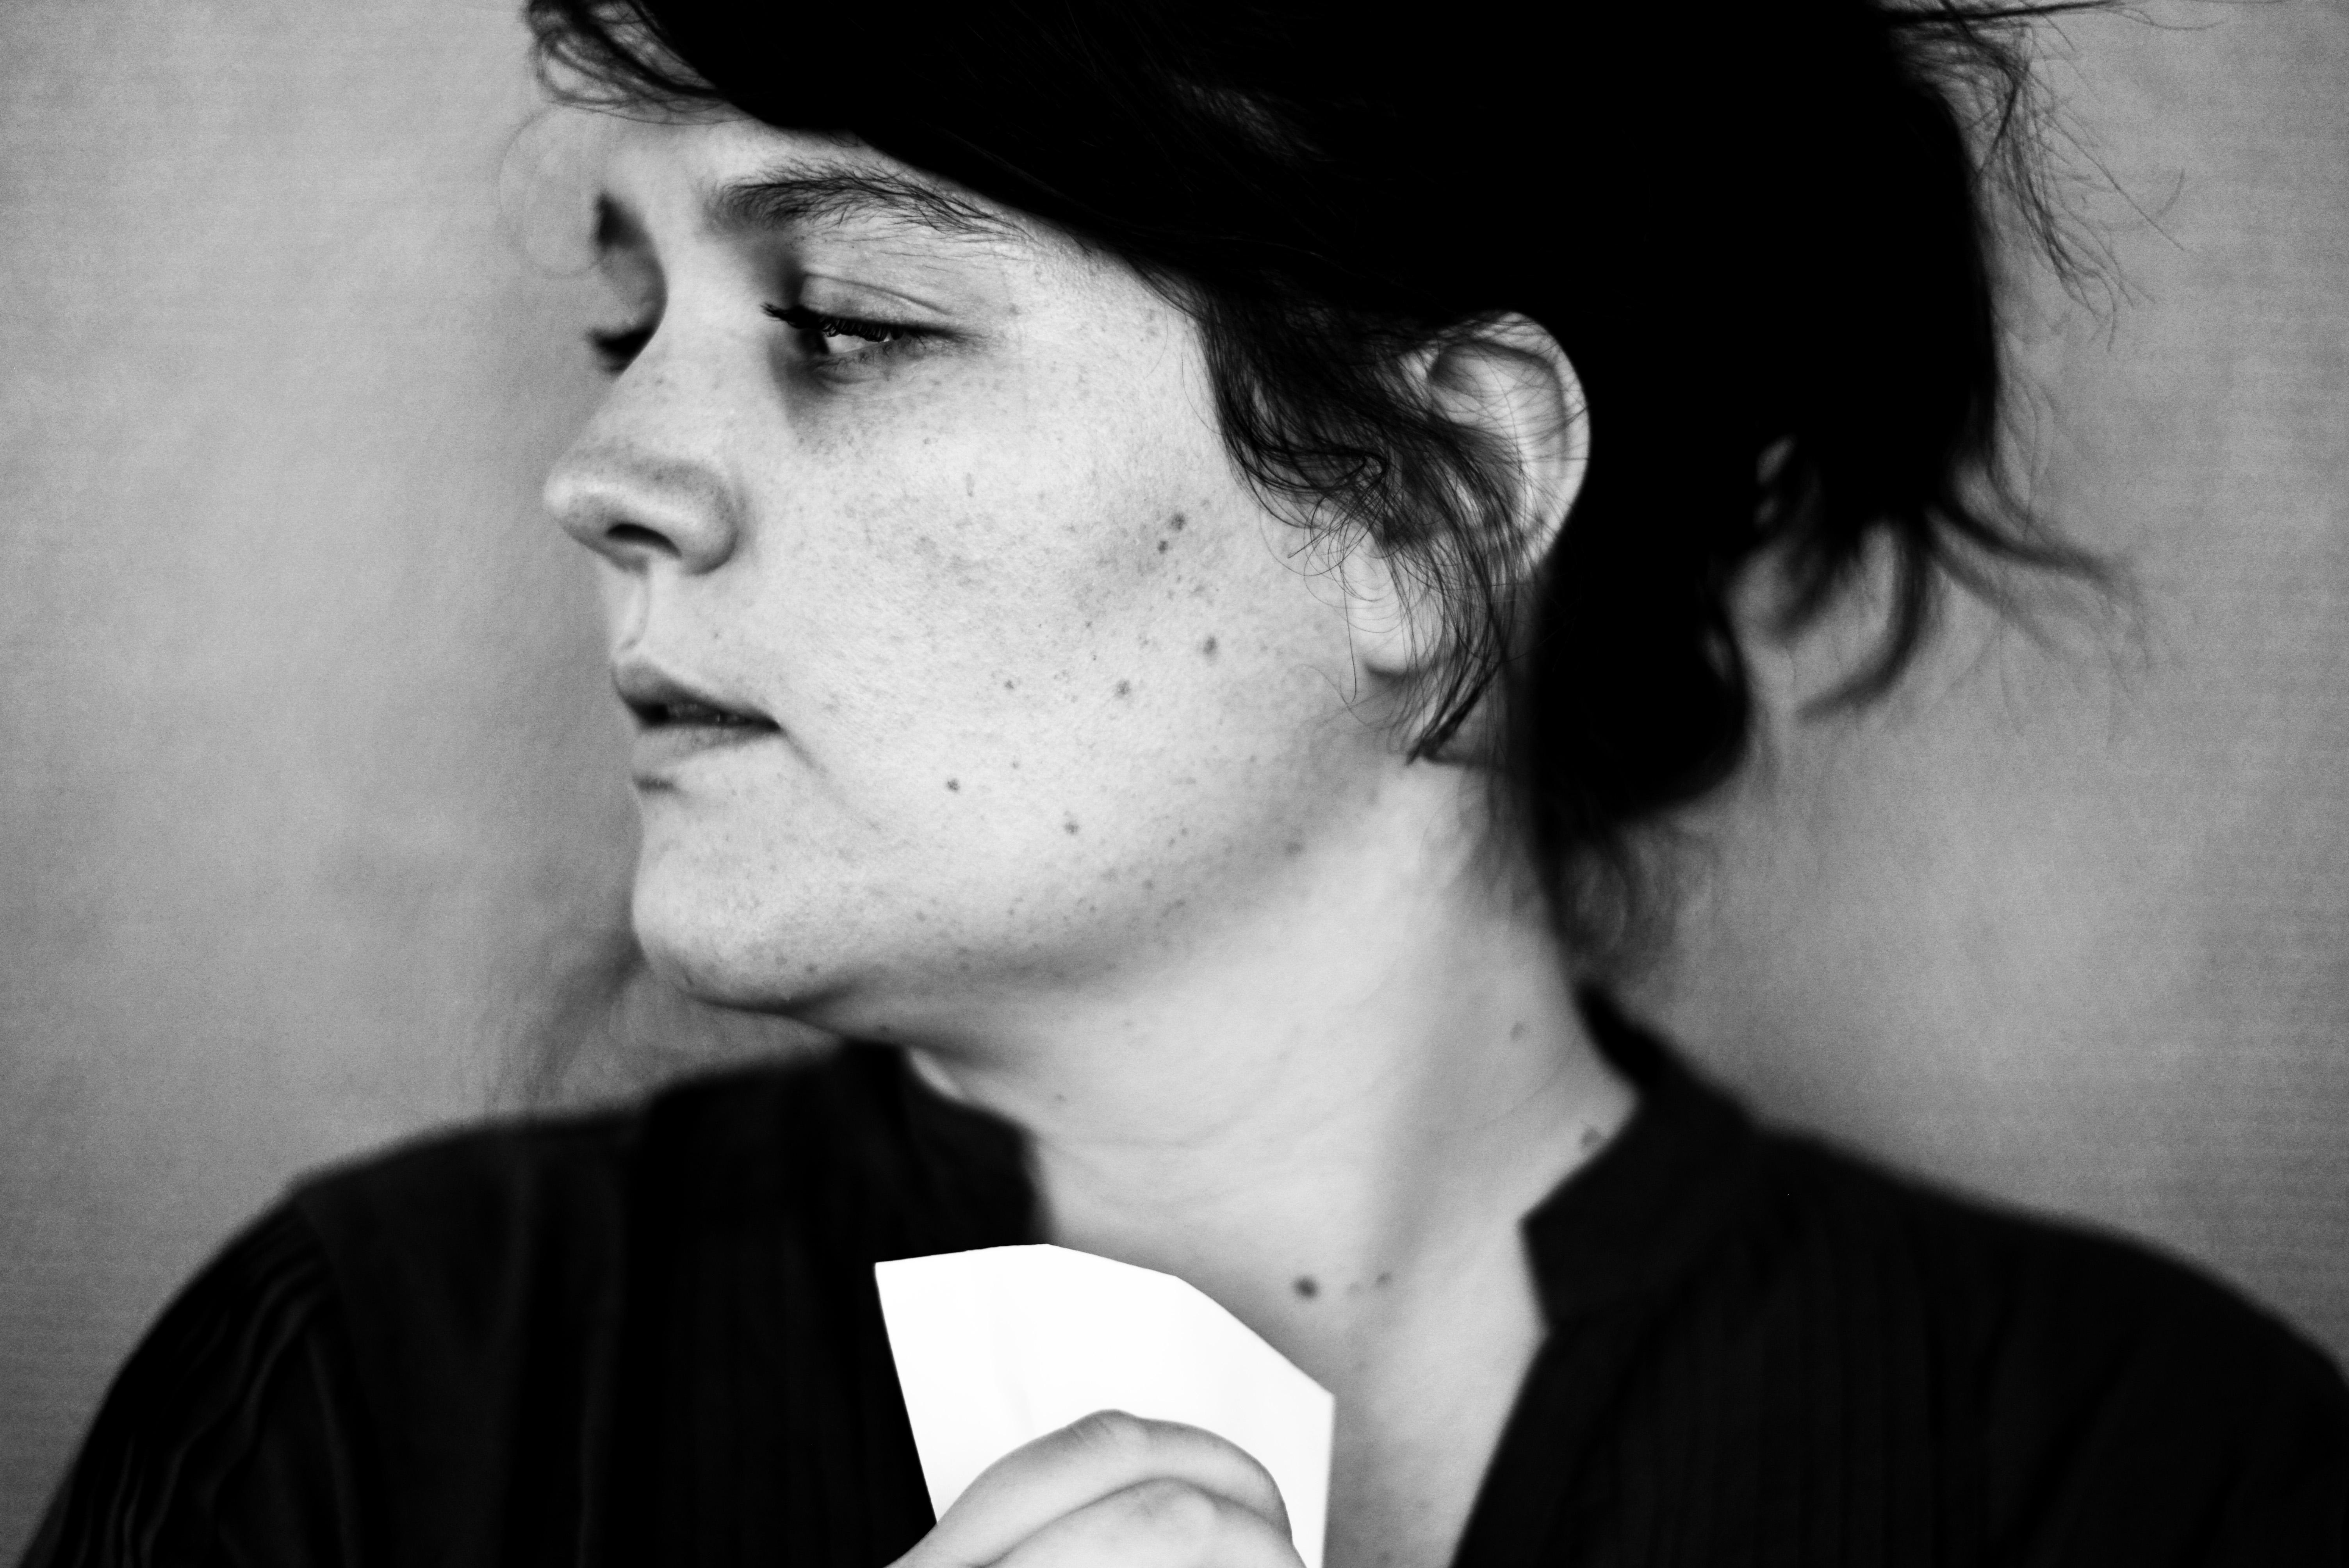 CaroleMigrante